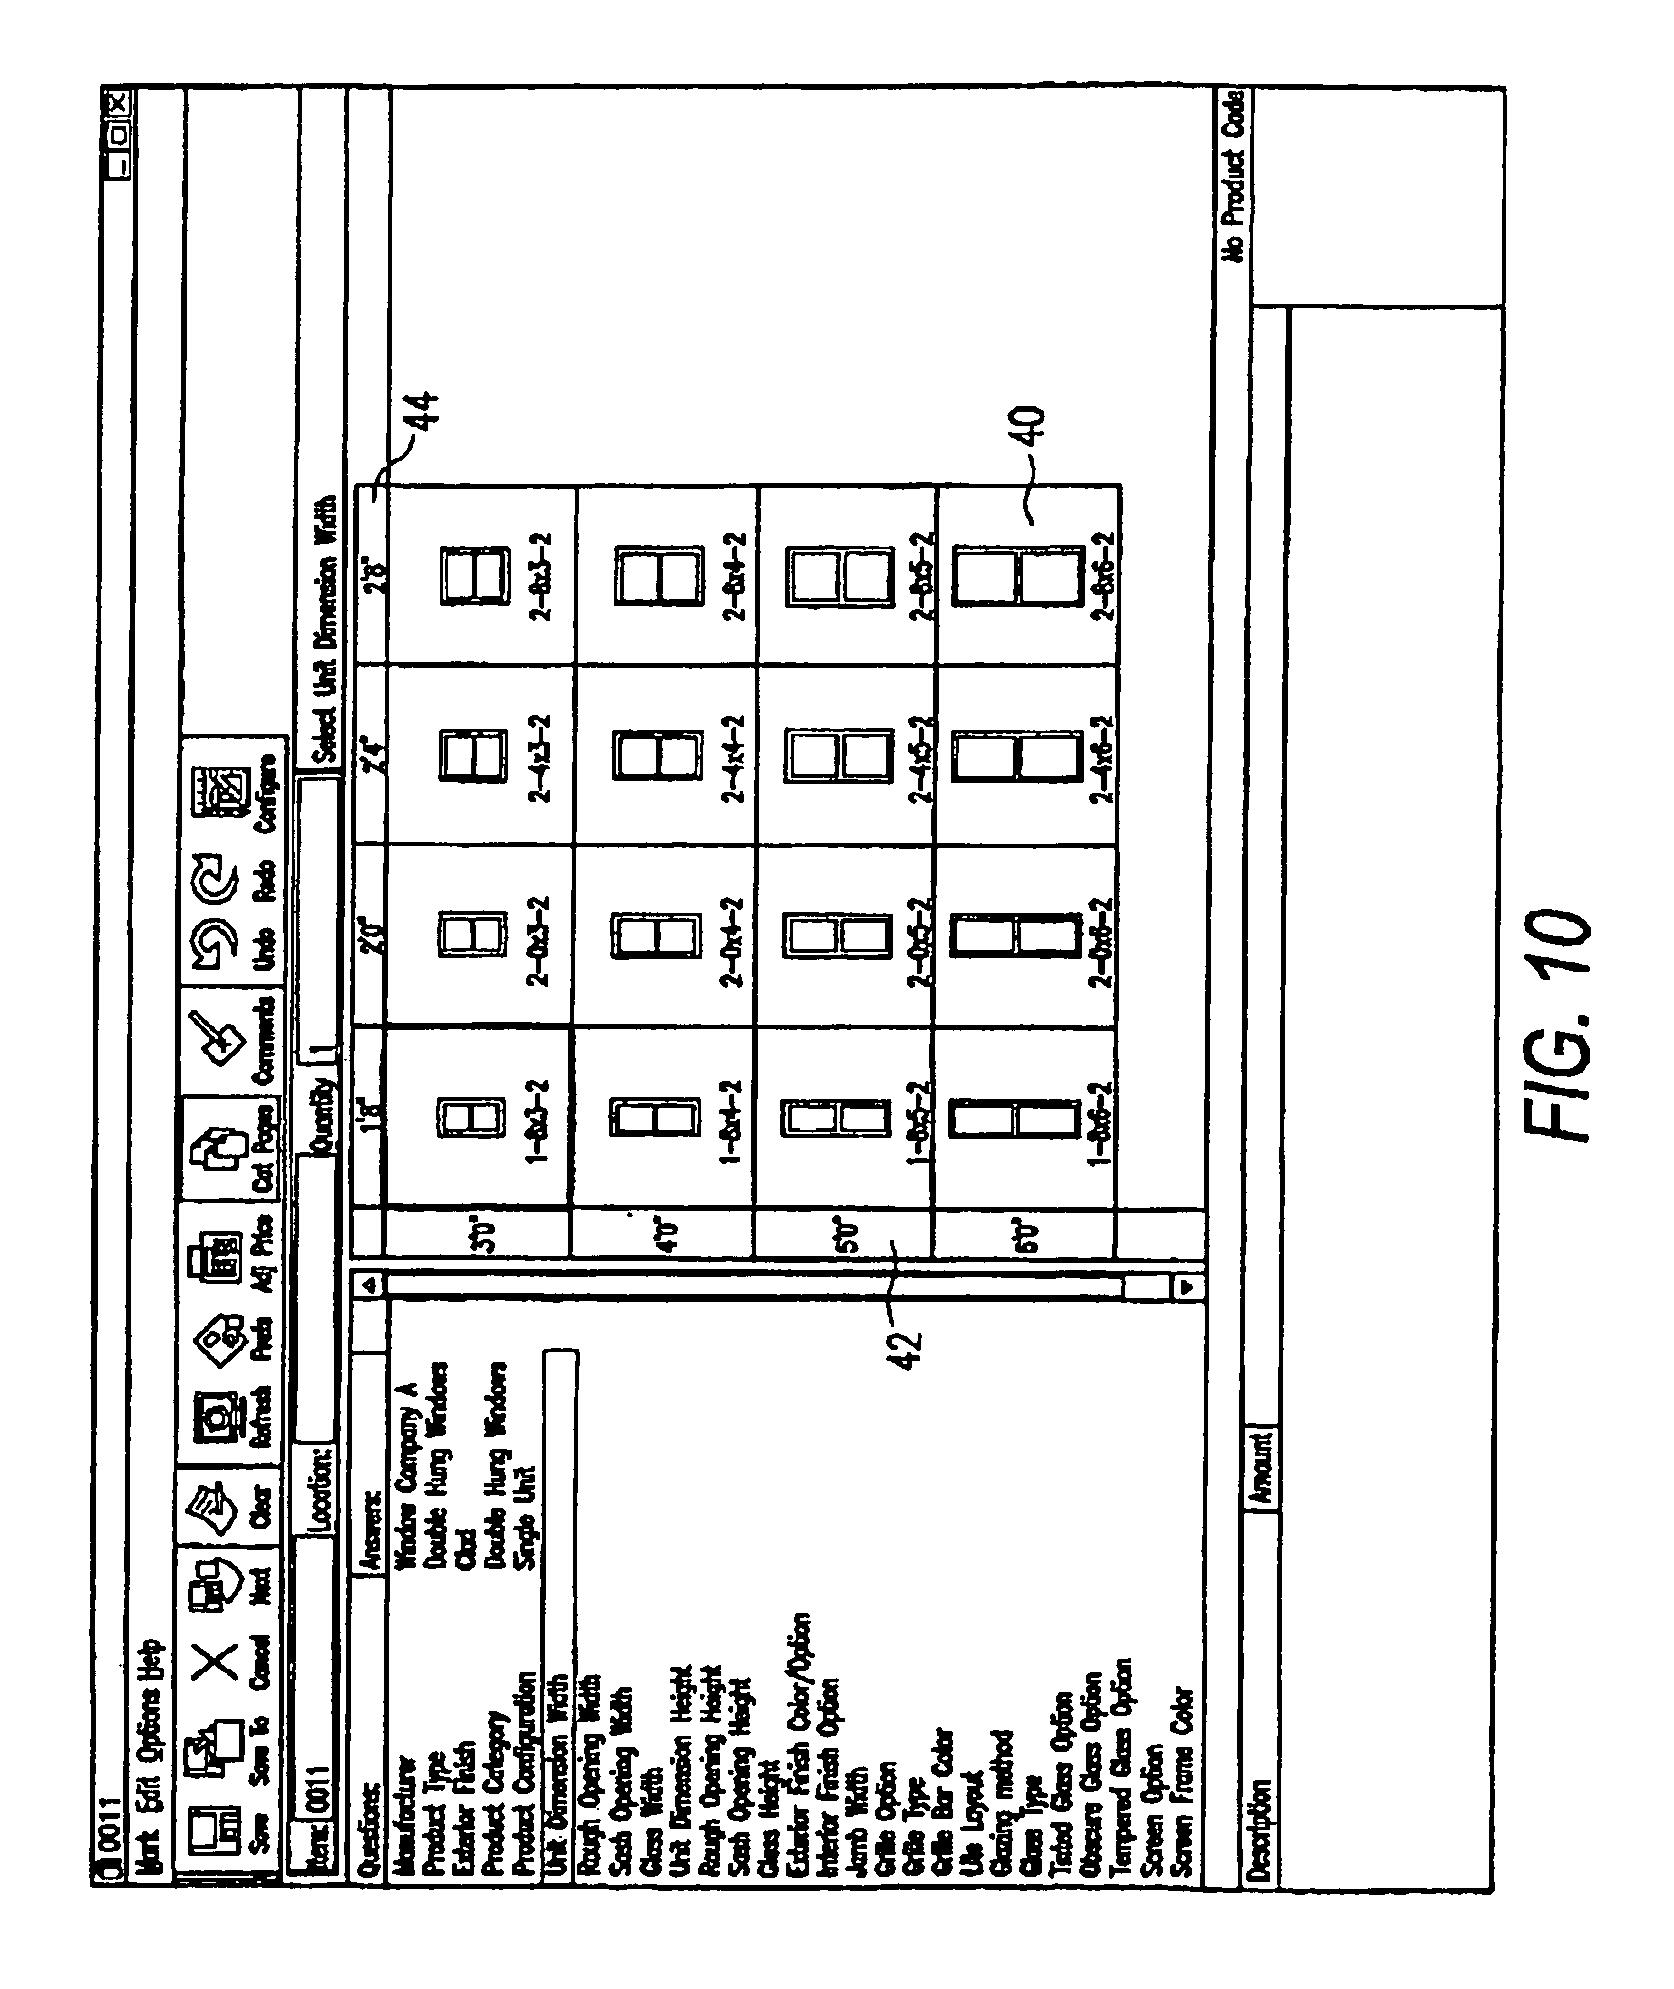 Casement Window Diagram : Window part diagram system frame